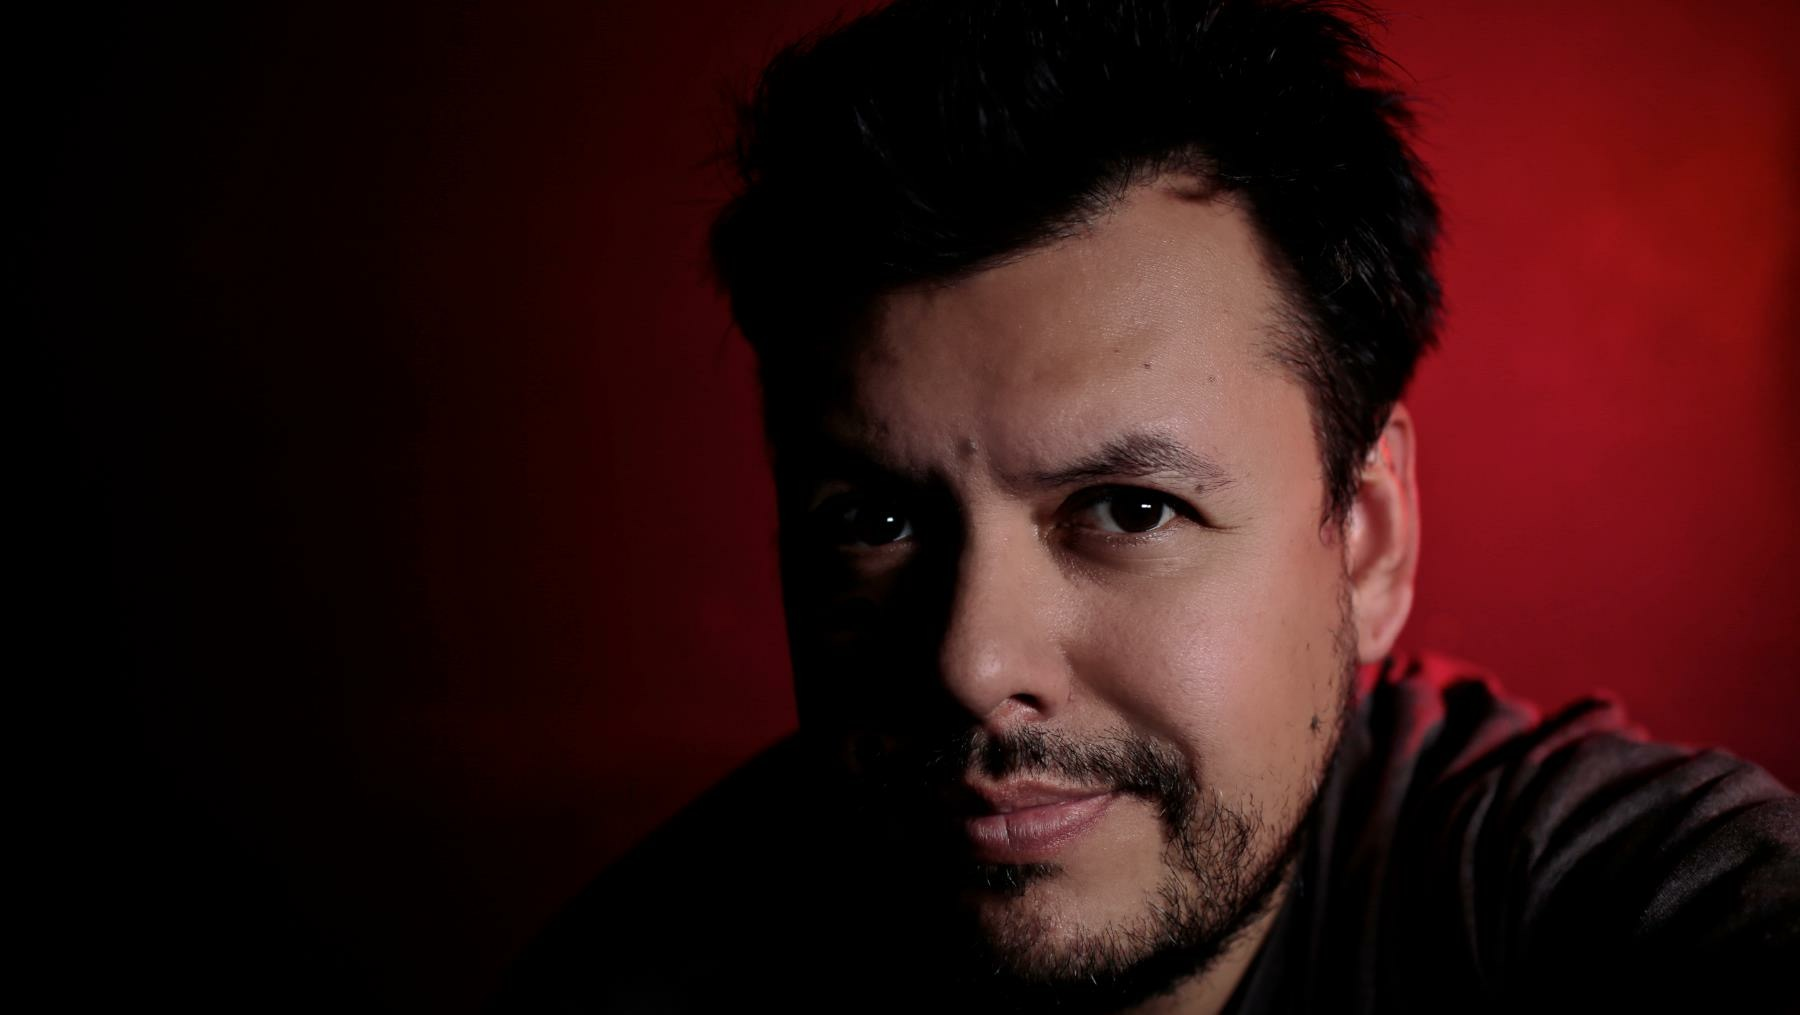 Jaime Blanco   Owner/Creative Director/Cinematographer/Composer  jaimeblanco@doublescopefilms.com 915-929-0606